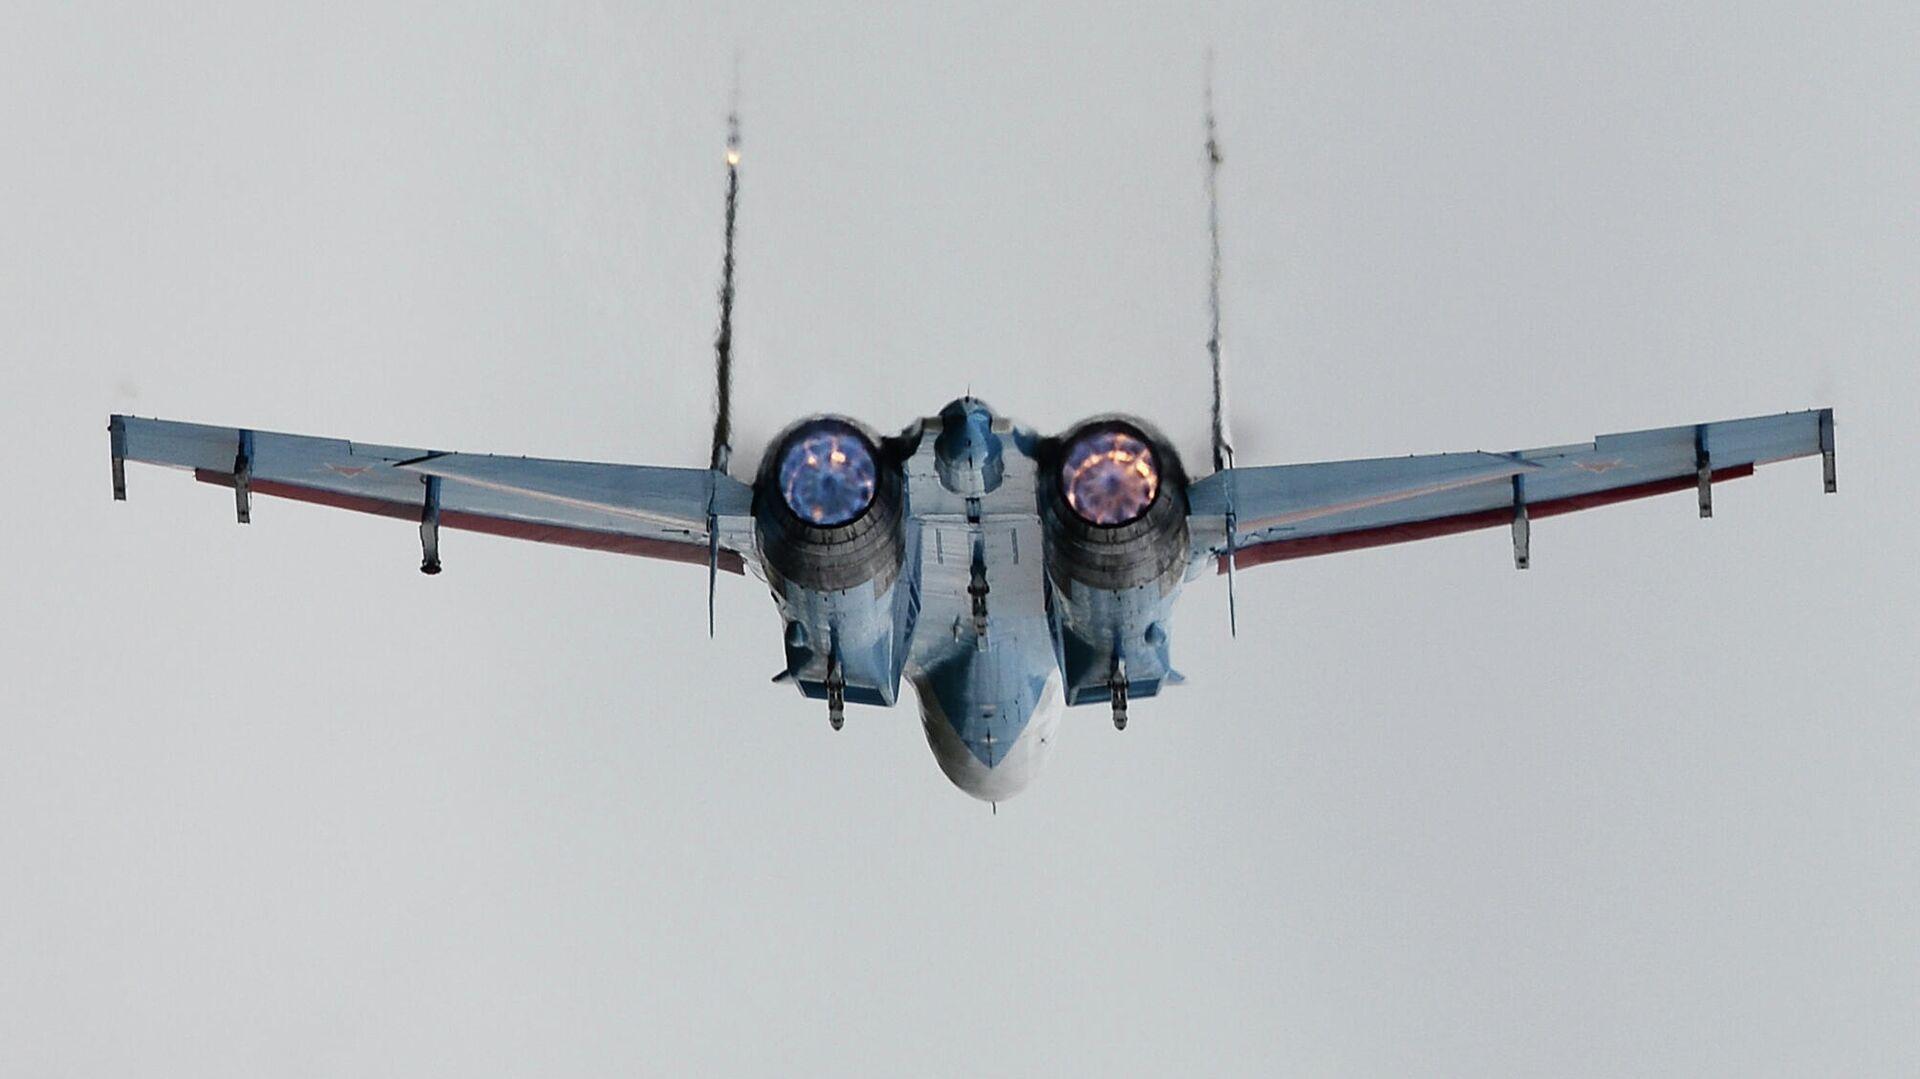 Самолет Су-27  - РИА Новости, 1920, 15.09.2020